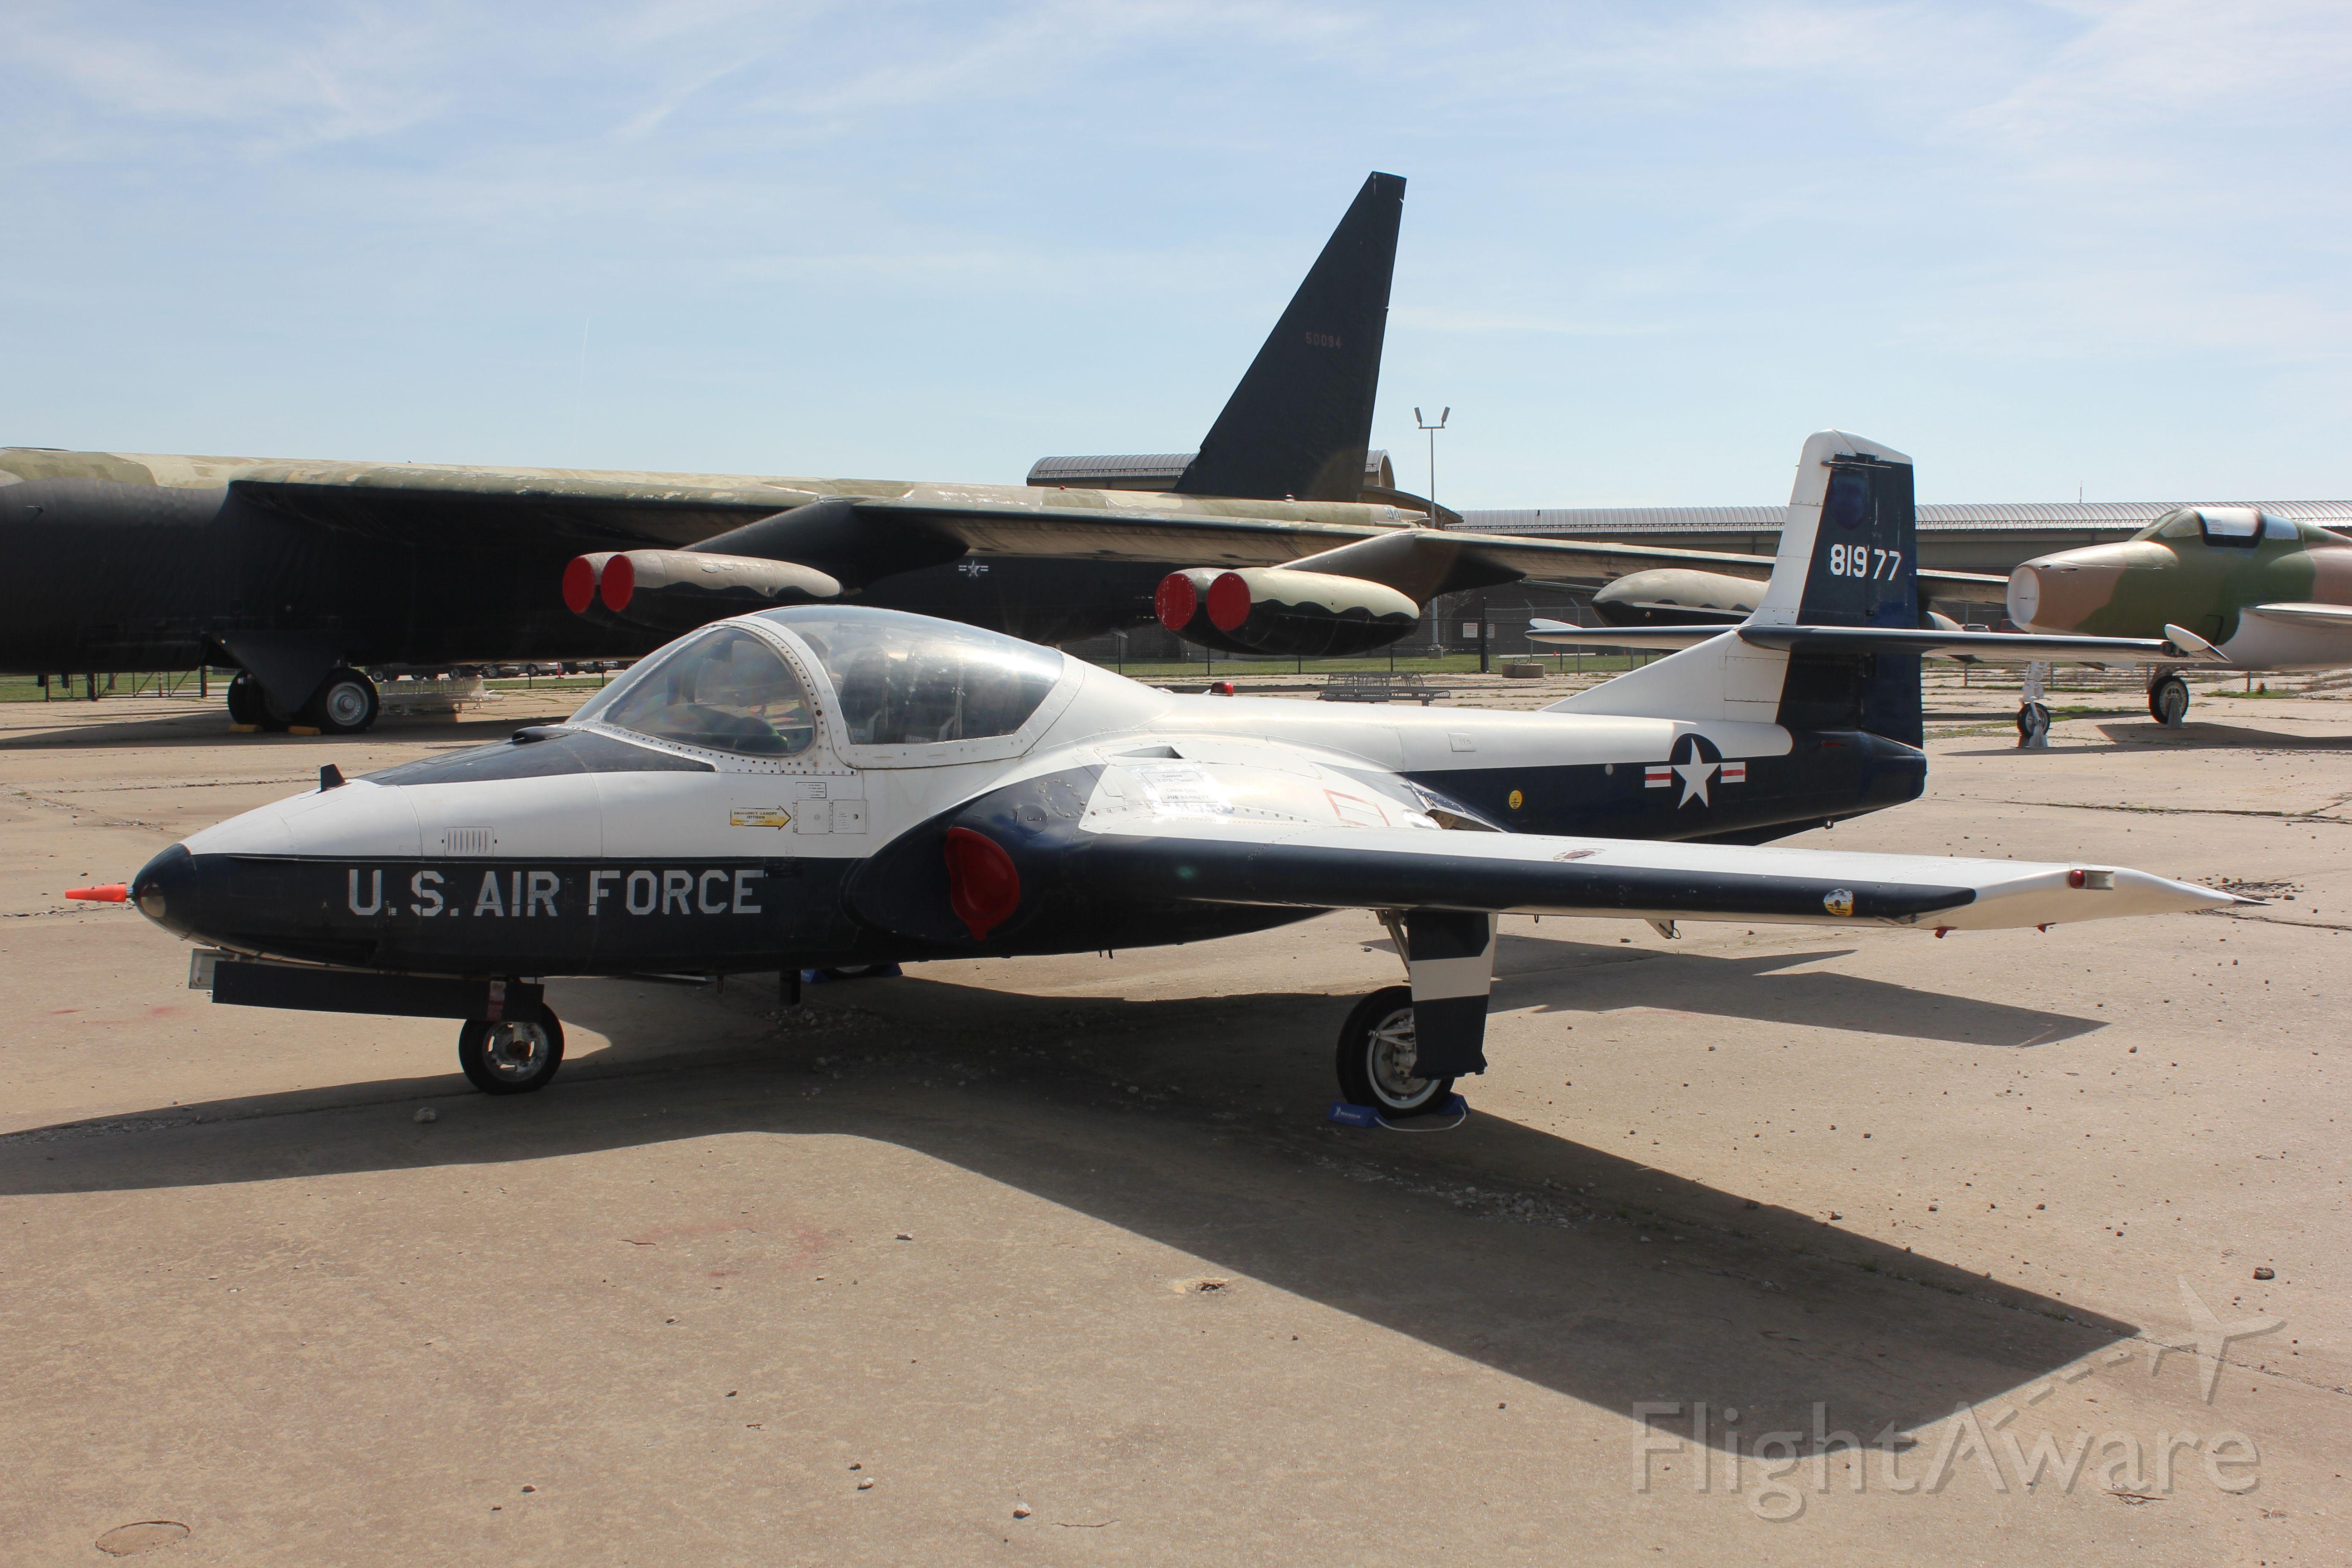 Cessna 318C (58-1977) - Cessna T-37 Tweety Bird at the Kansas Air Museum in Wichita.